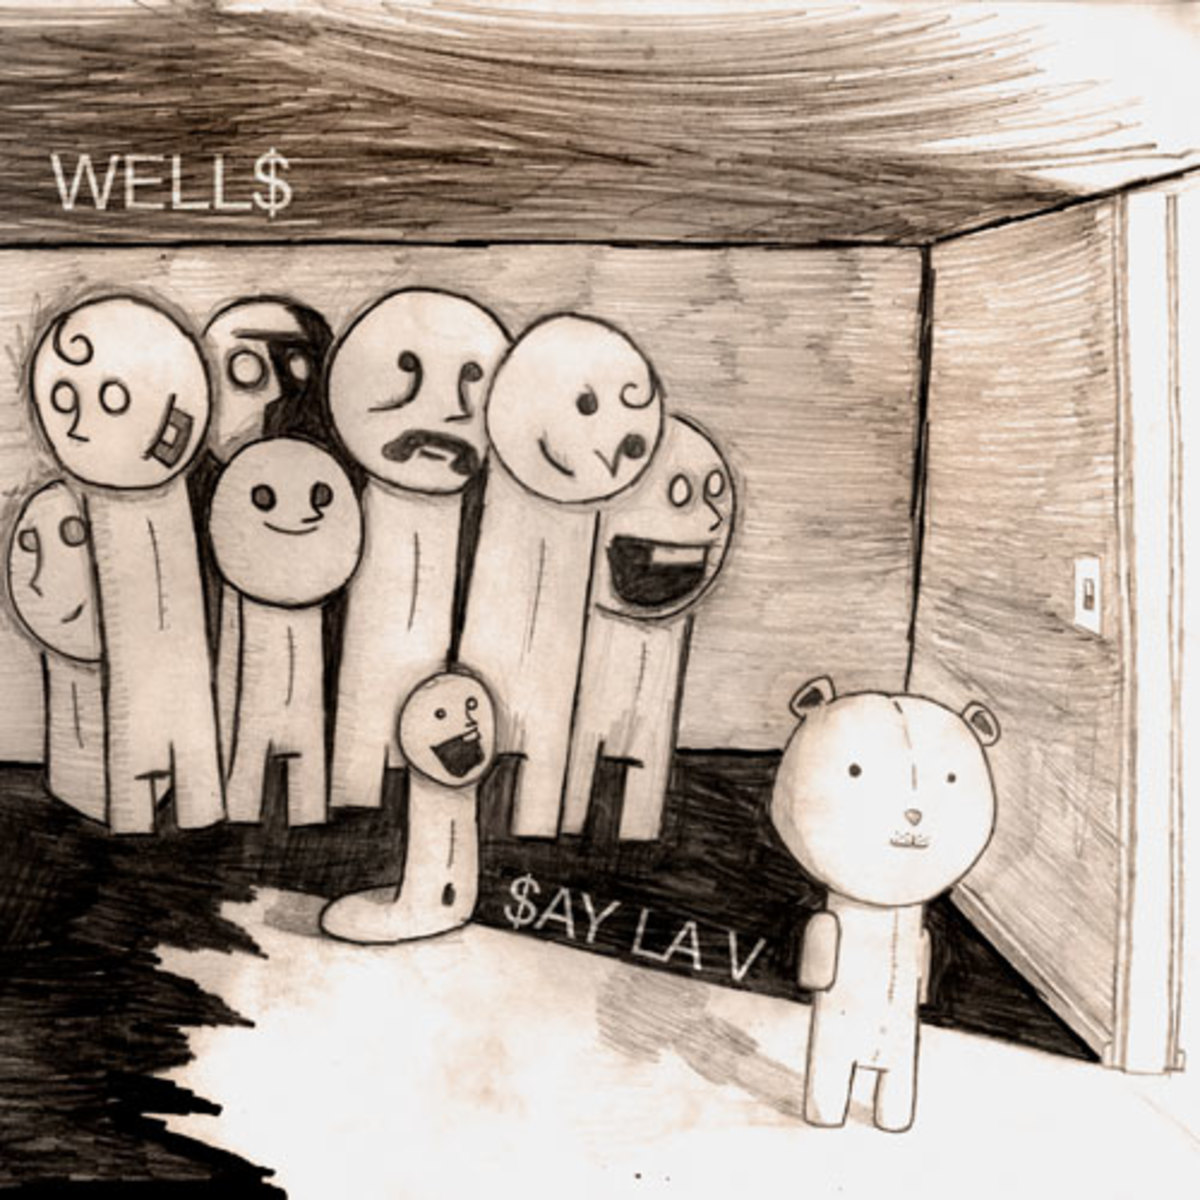 wells-saylave.jpg